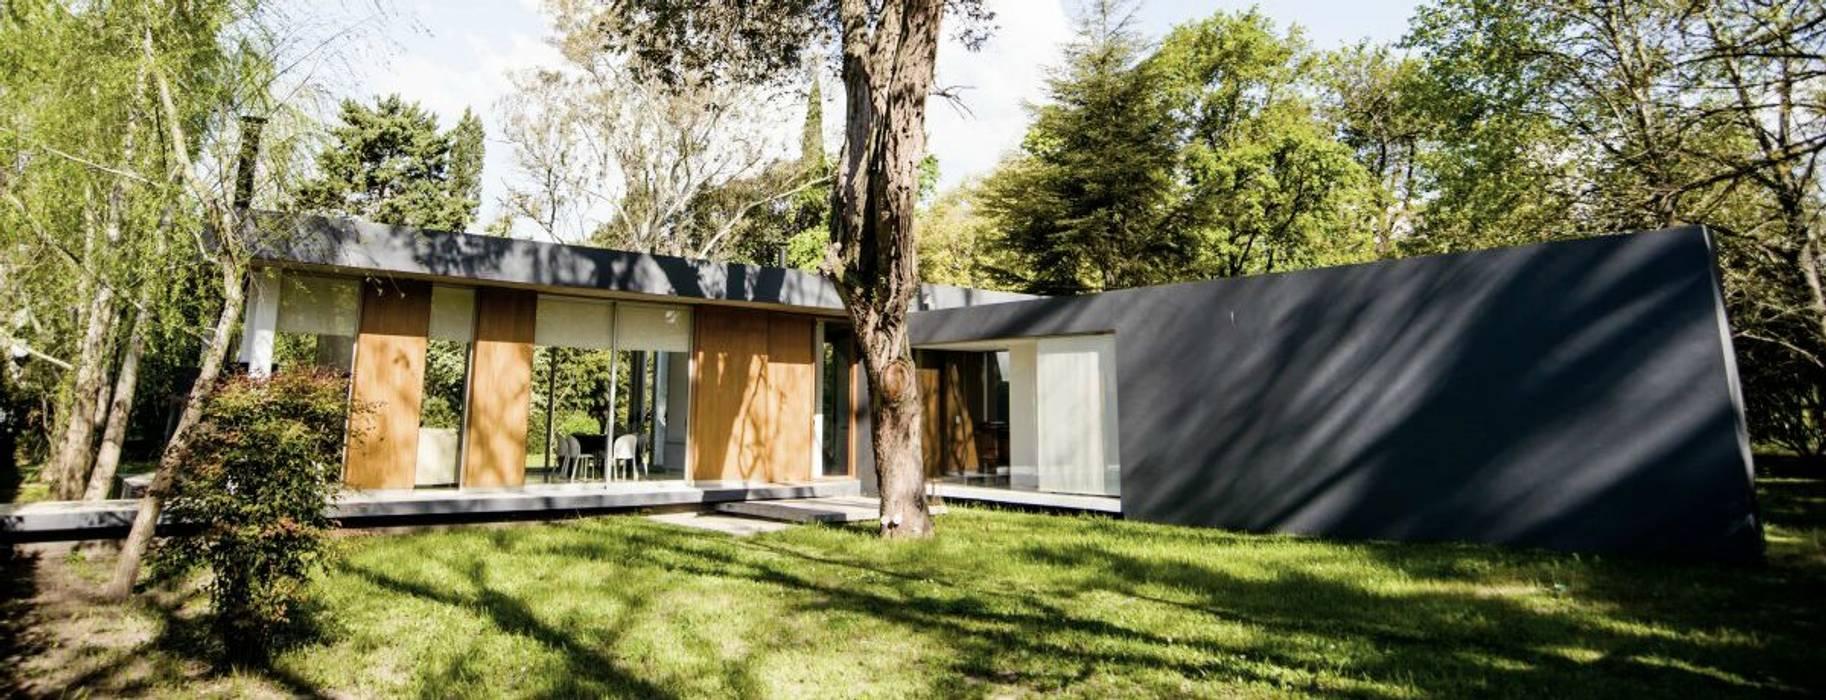 Casa AP Taman Modern Oleh Felipe Gonzalez Arzac Modern